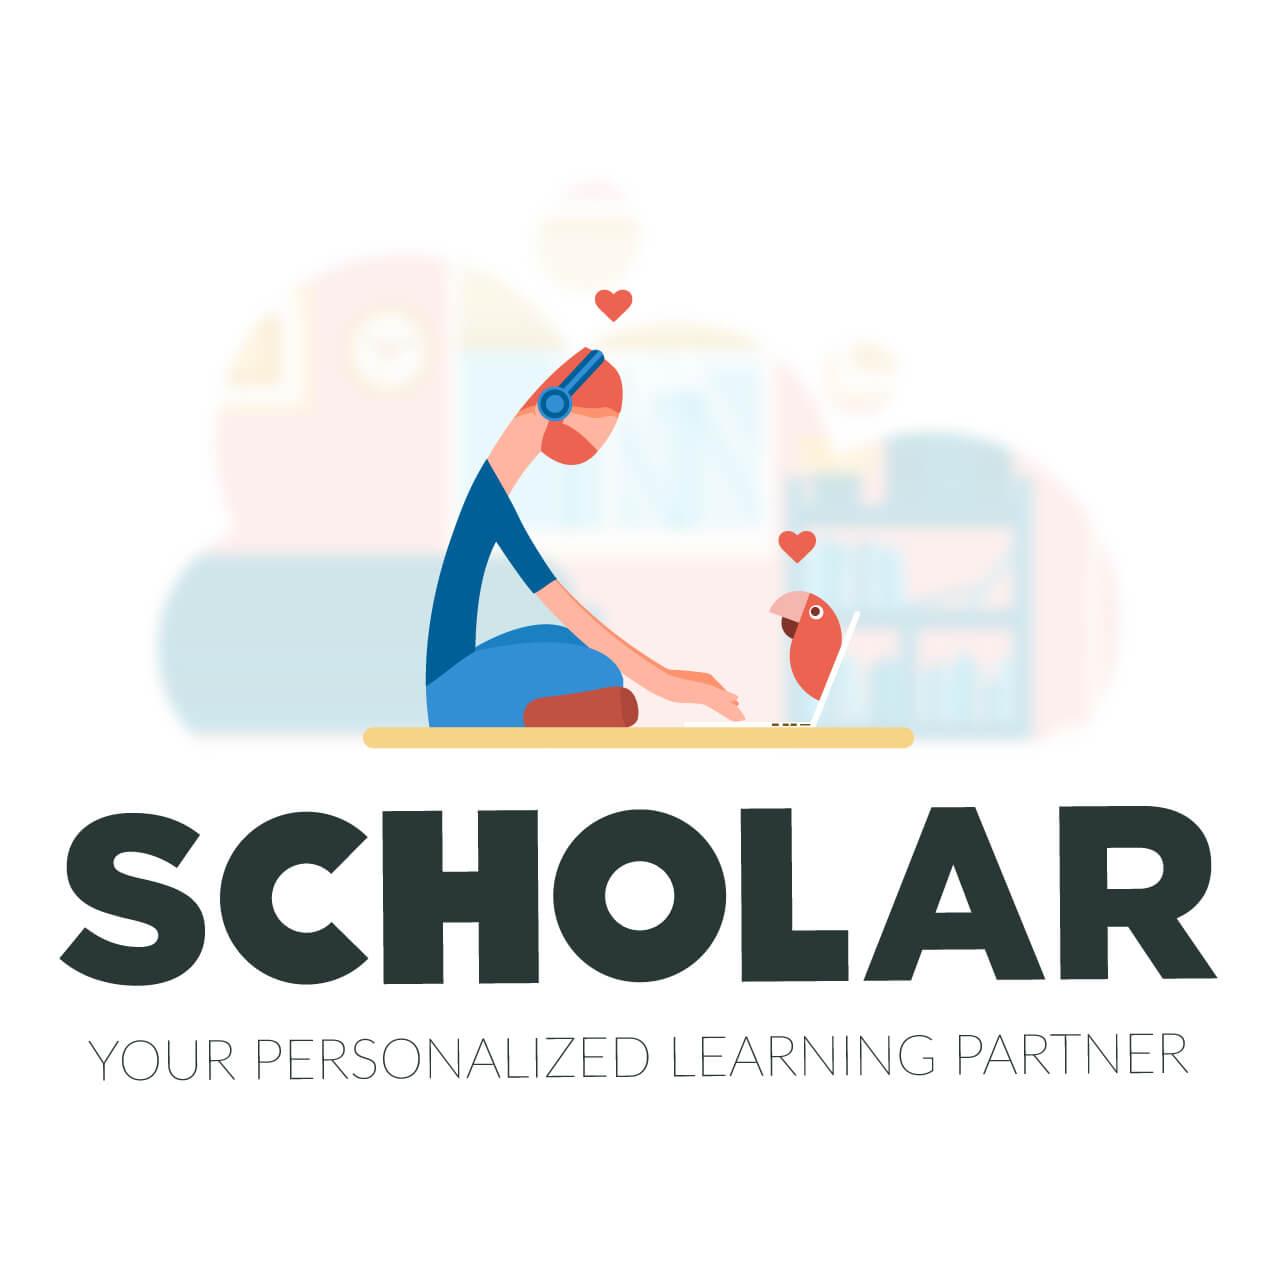 scholar-slogan